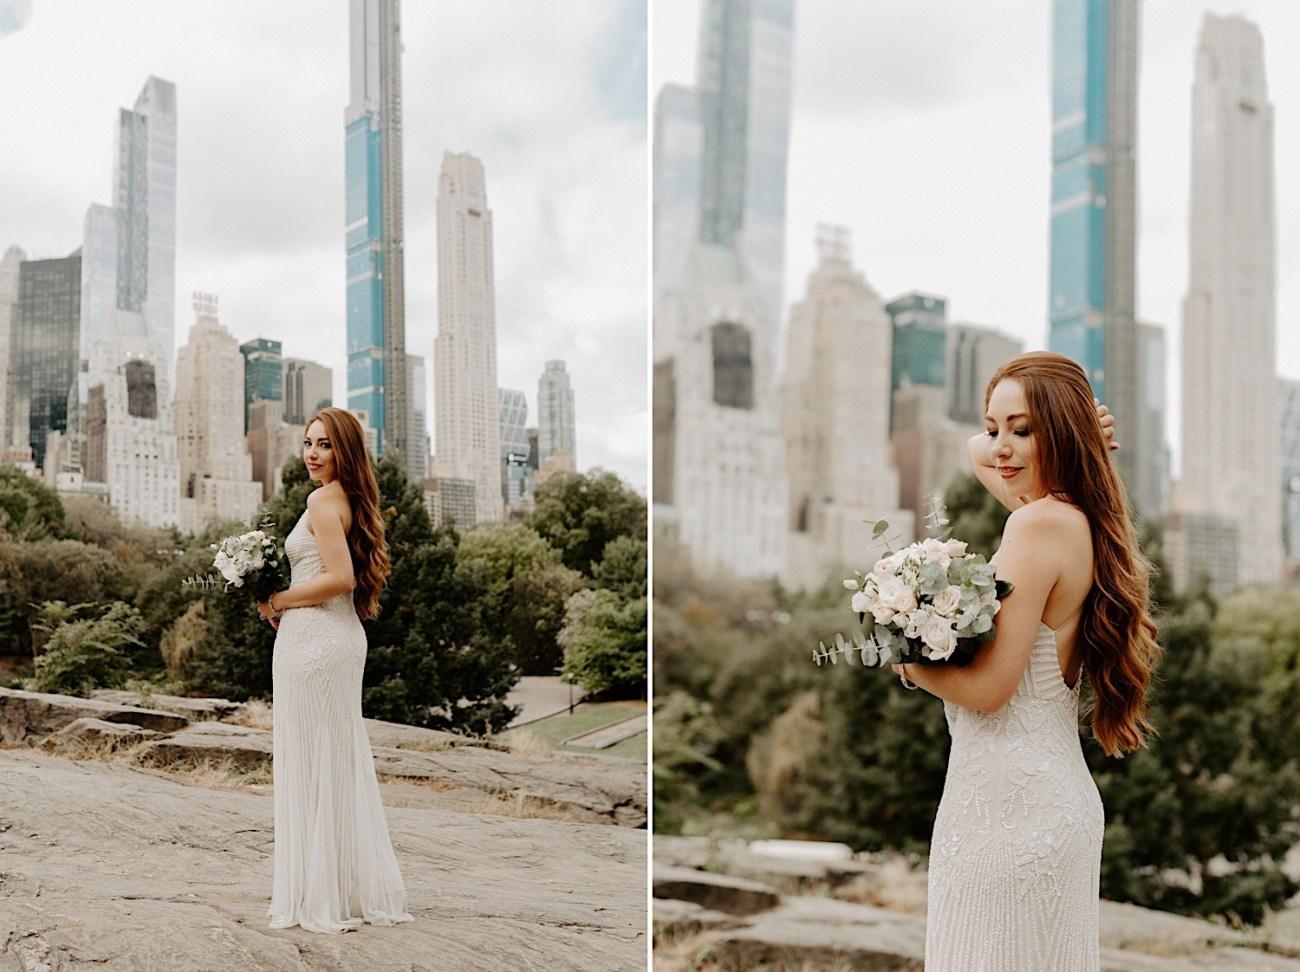 Central Park Wedding Photos Central Park Elopement NYC Wedding Photographer 10